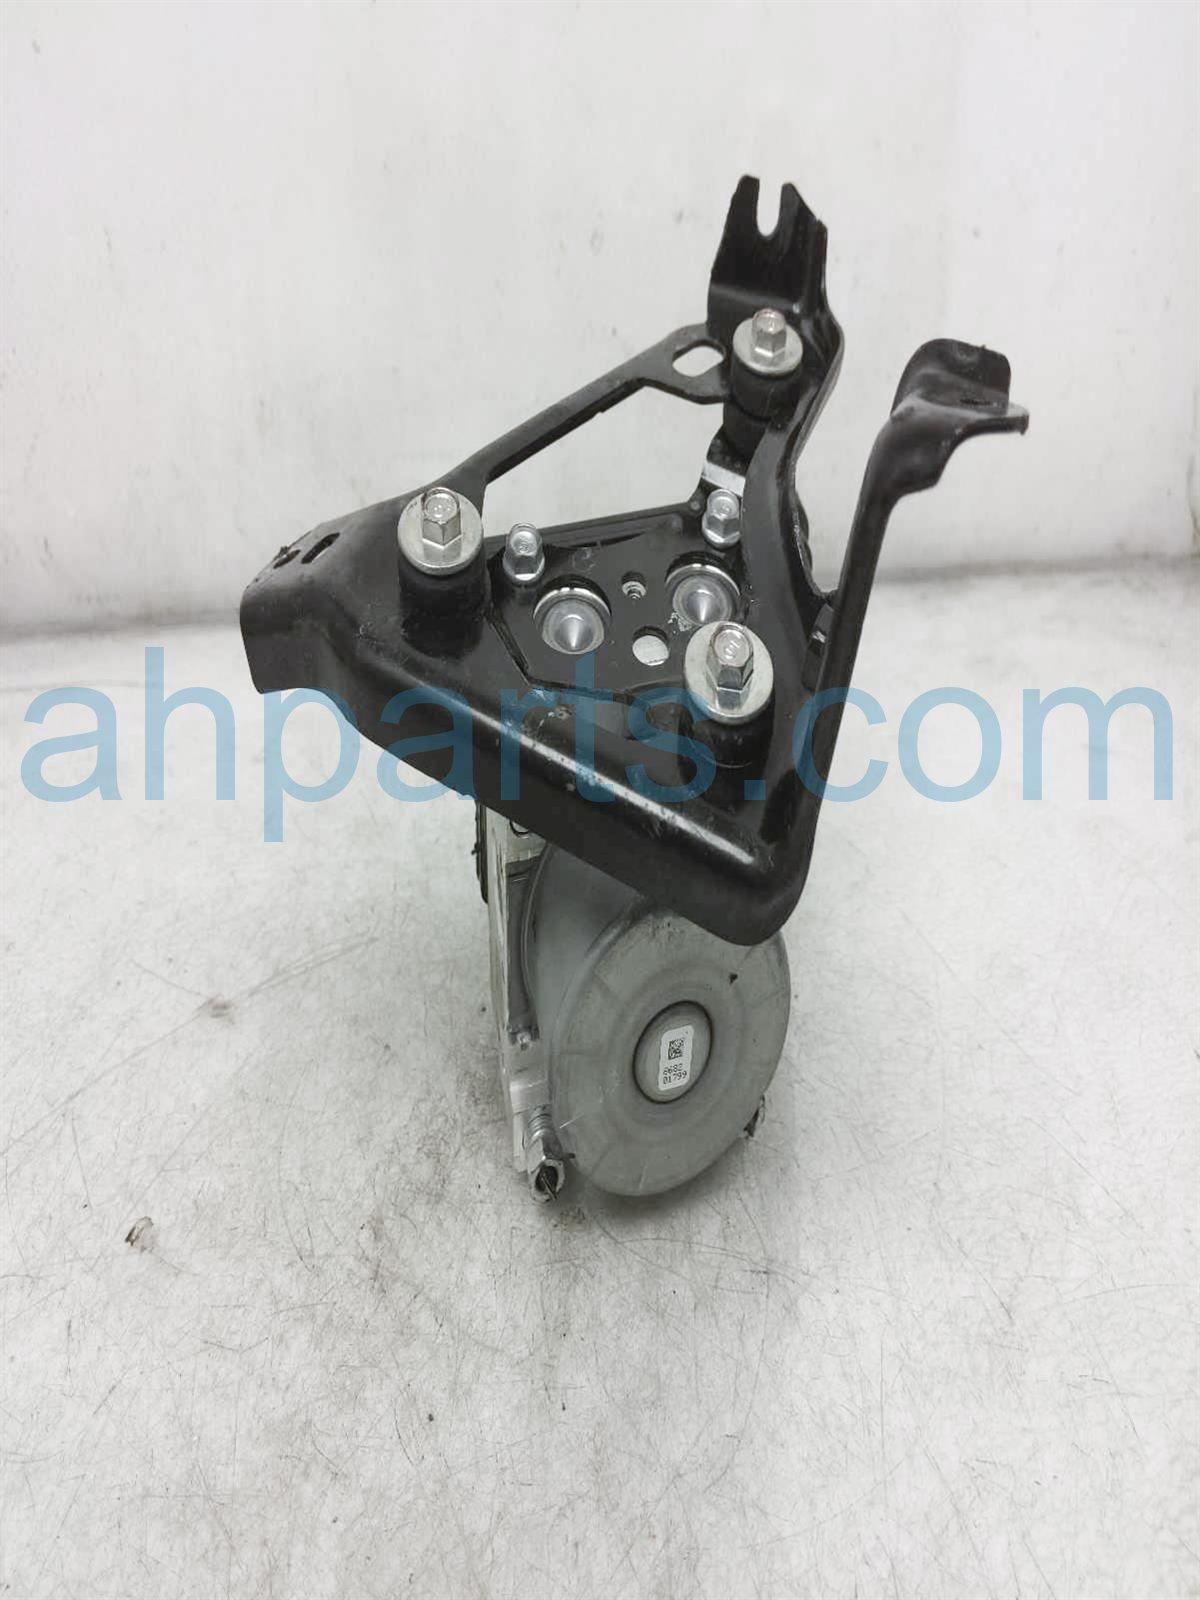 2019 Honda Passport (anti Lock Brake) Abs/vsa Pump/modulator 57111 TGS A53 Replacement